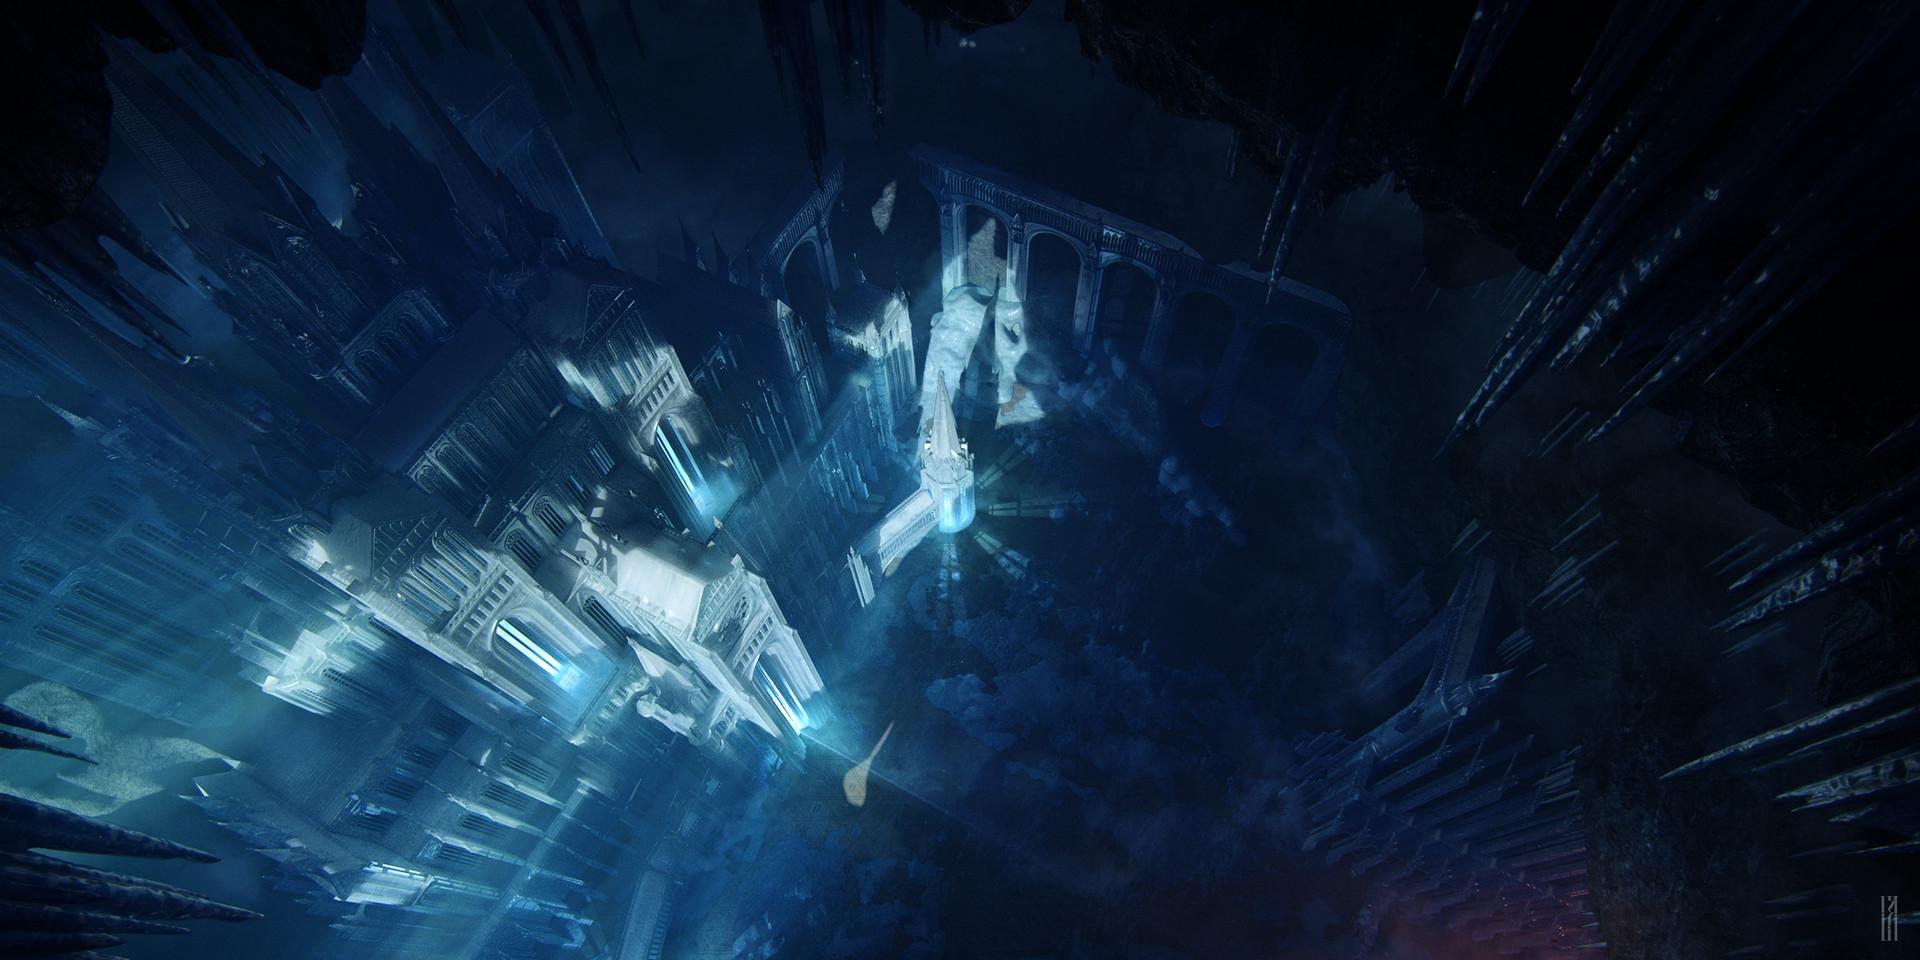 Alex lukianov ice castle top view